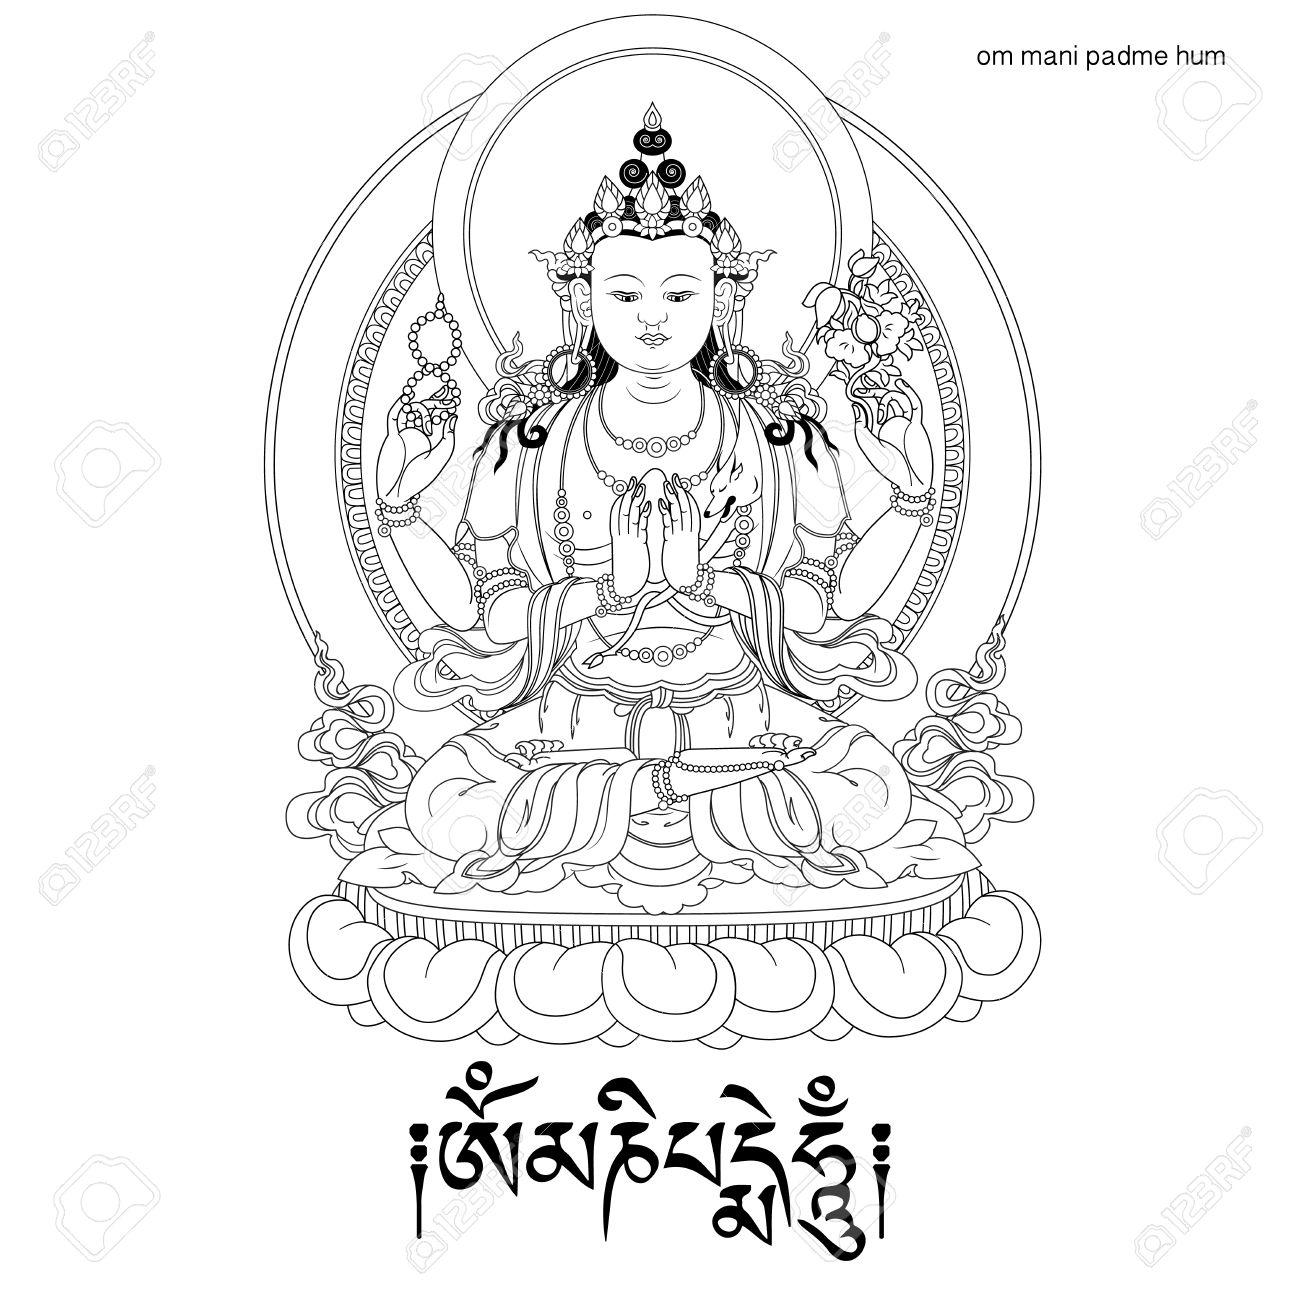 Vector illustration with Avalokiteshvara and mantra OM MANI